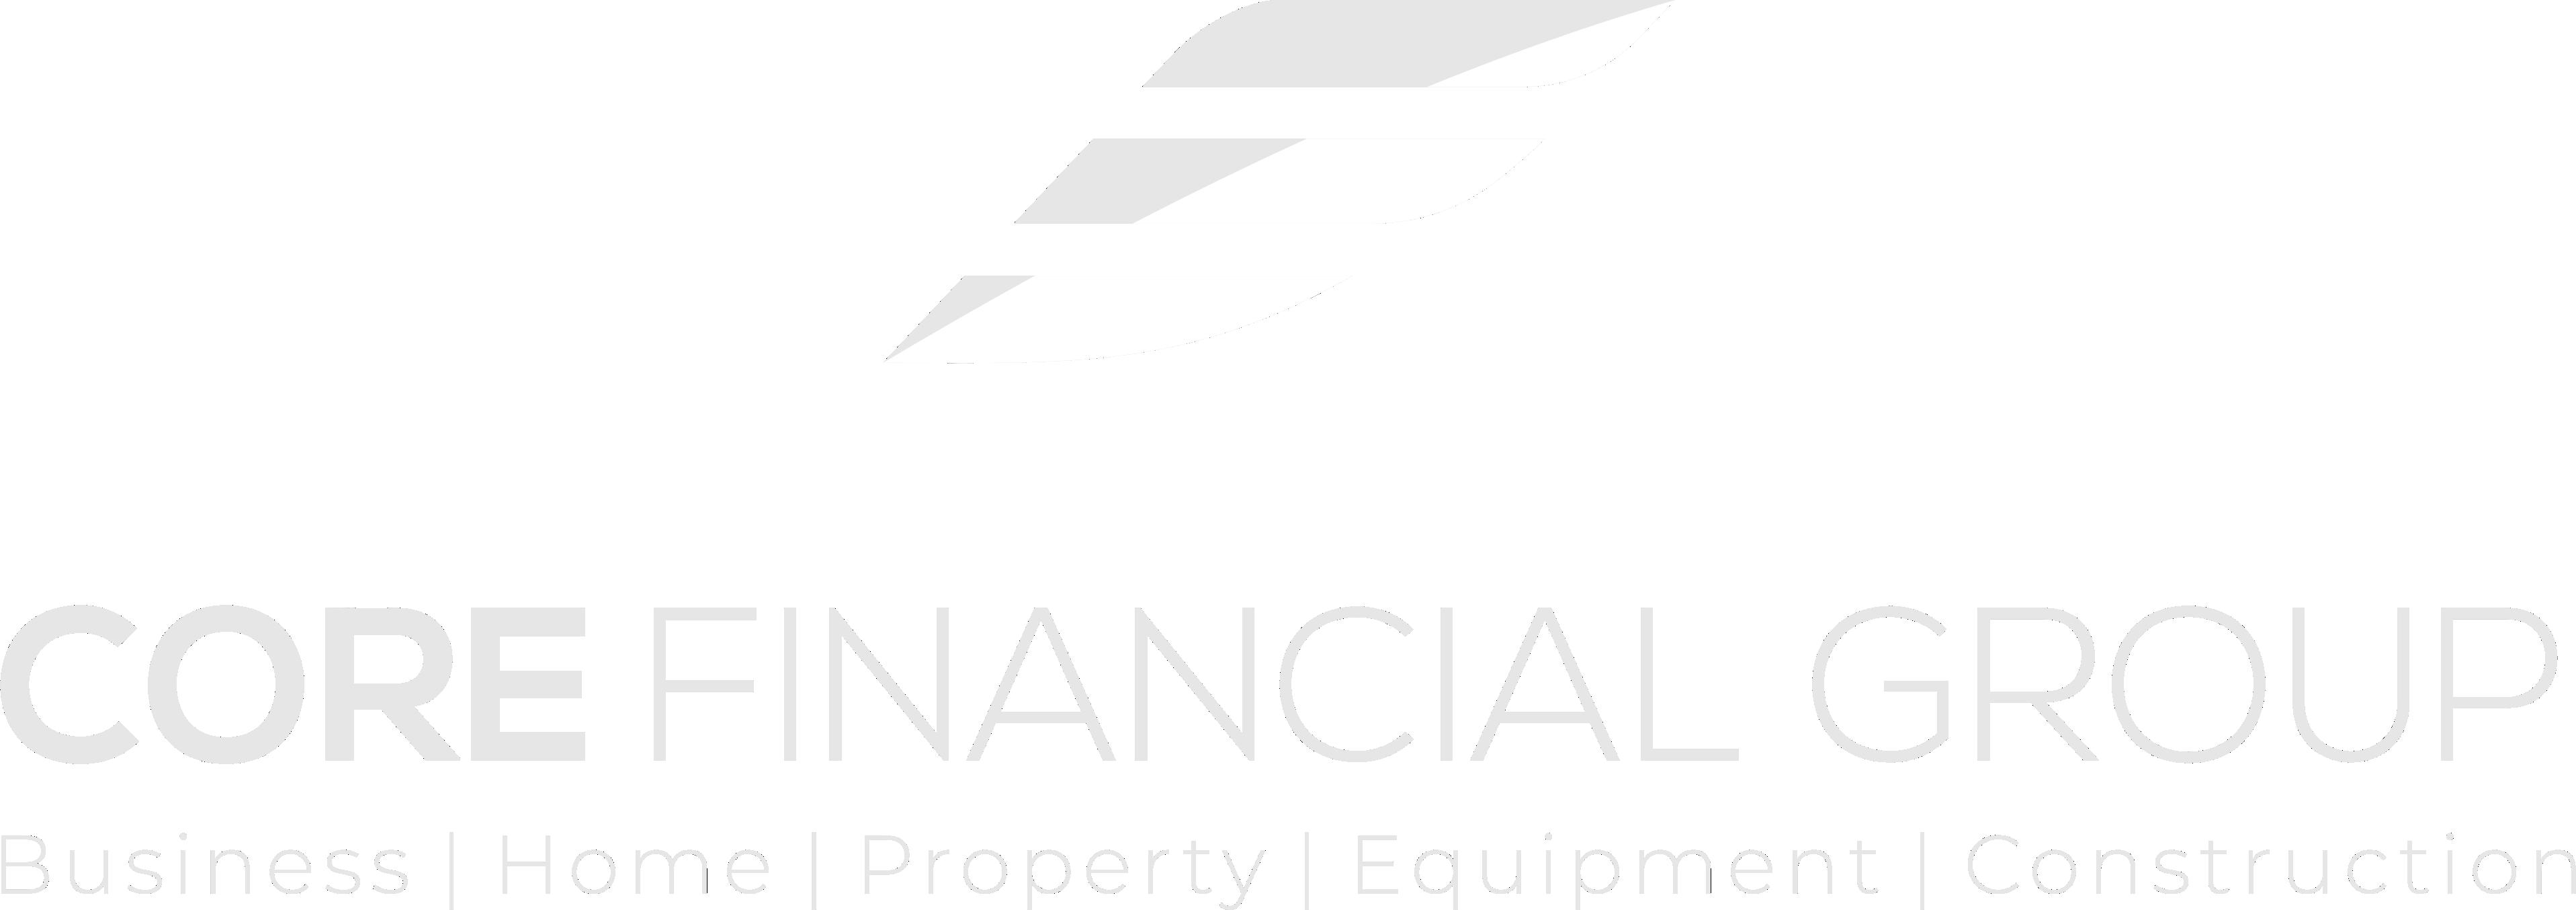 Sophisticated logo for Reputable Finance Broker